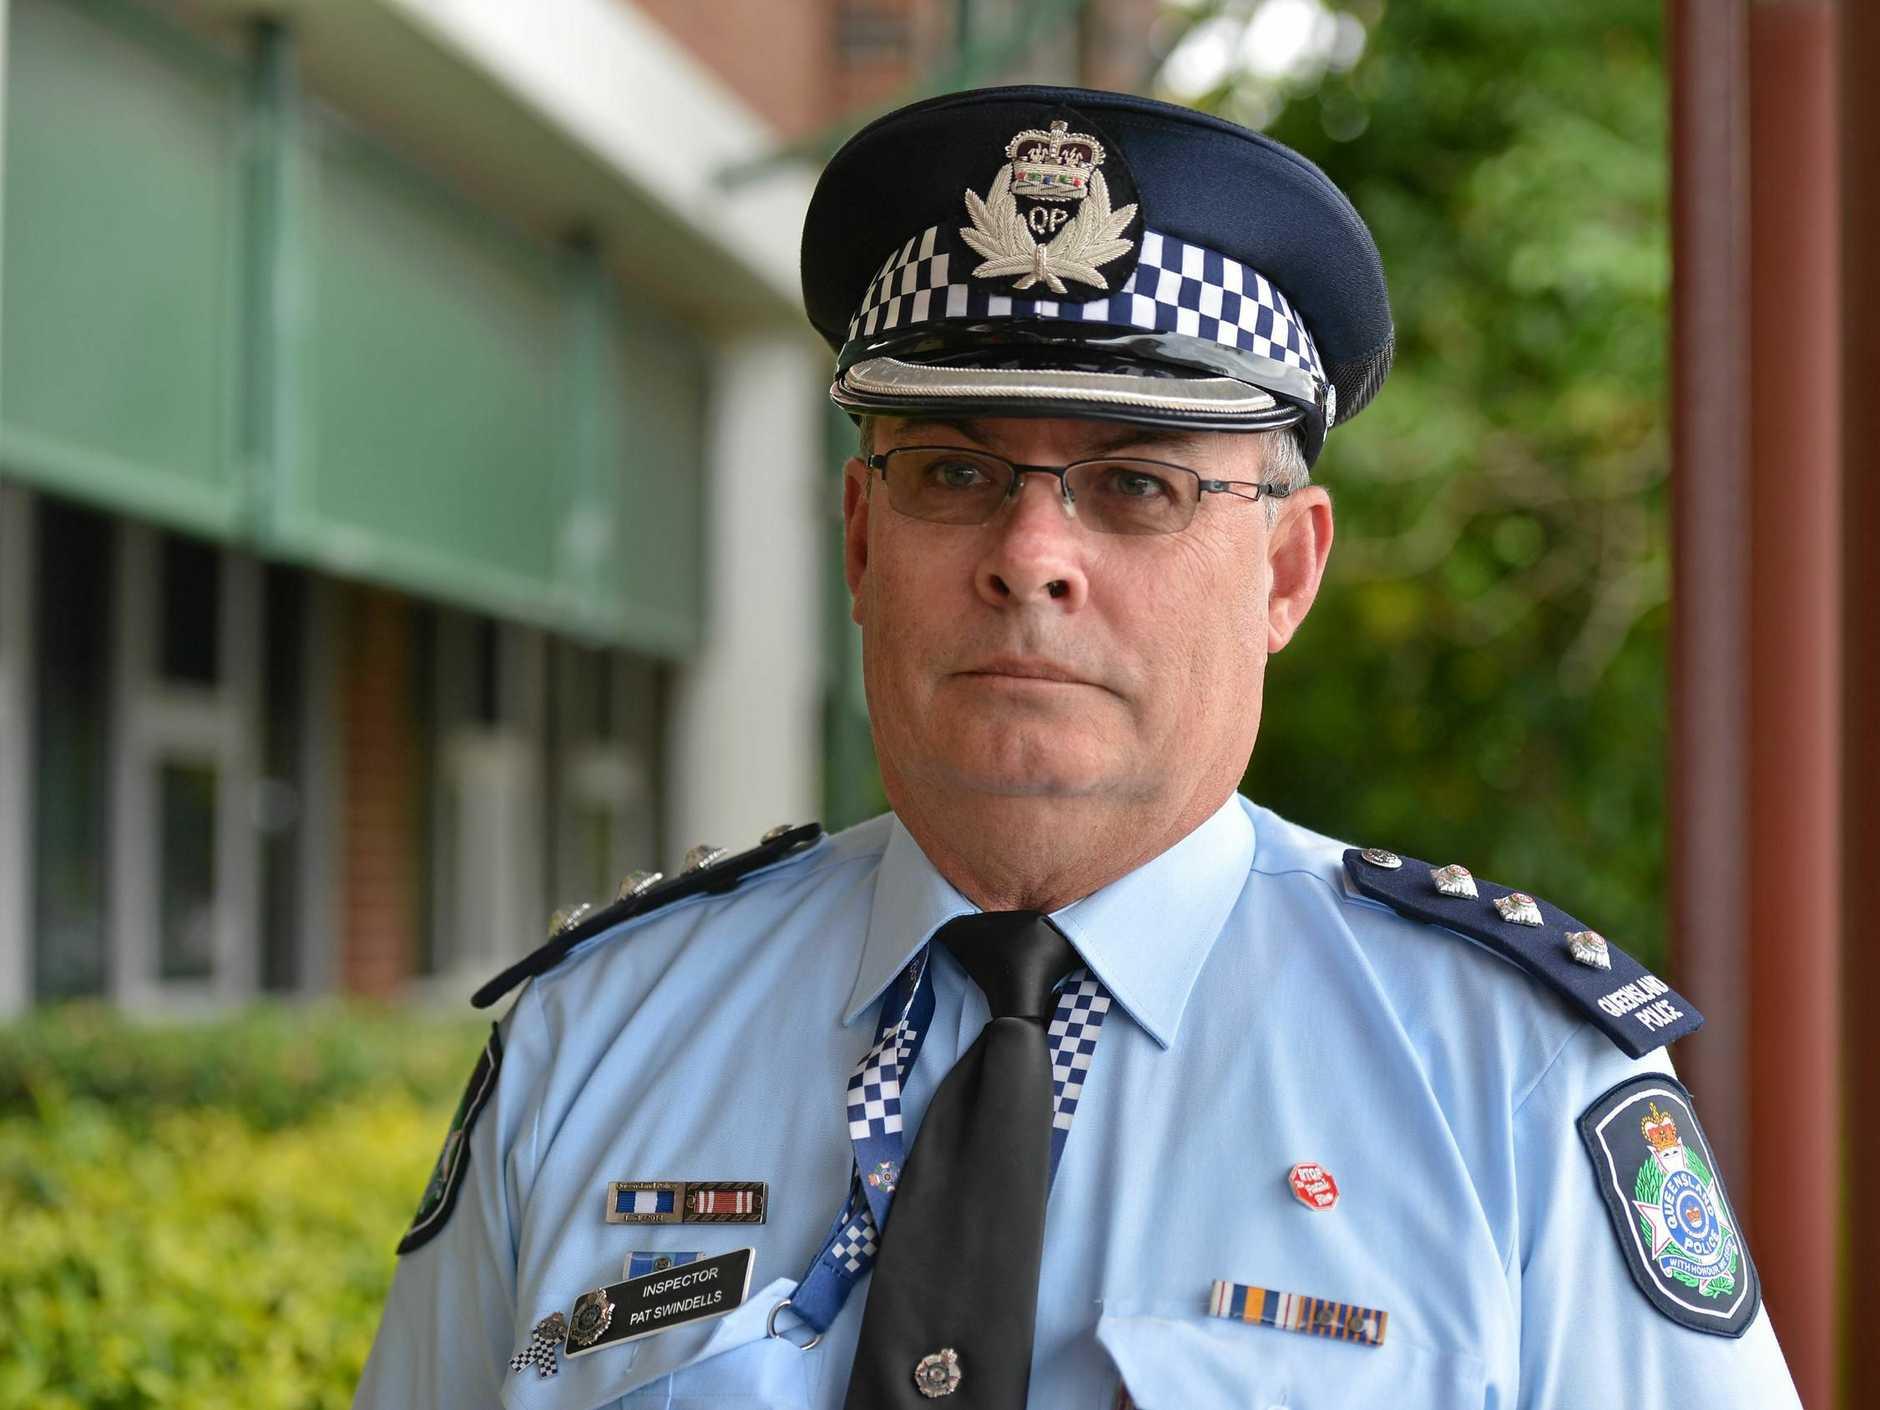 Inspector Pat Swindells.